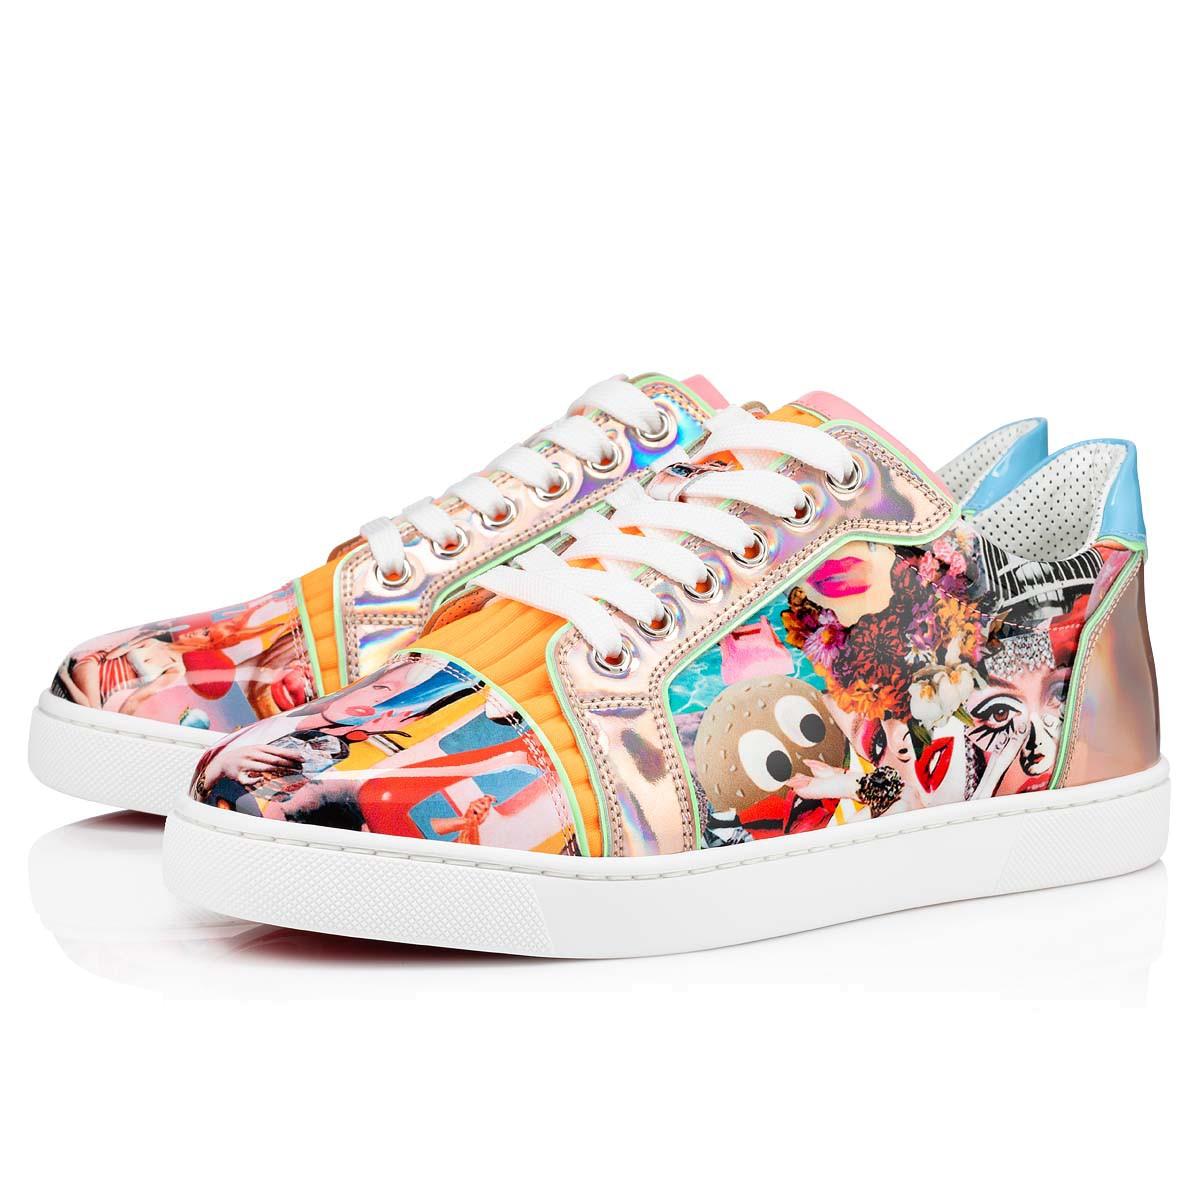 Shoes - Vieira Flat - Christian Louboutin